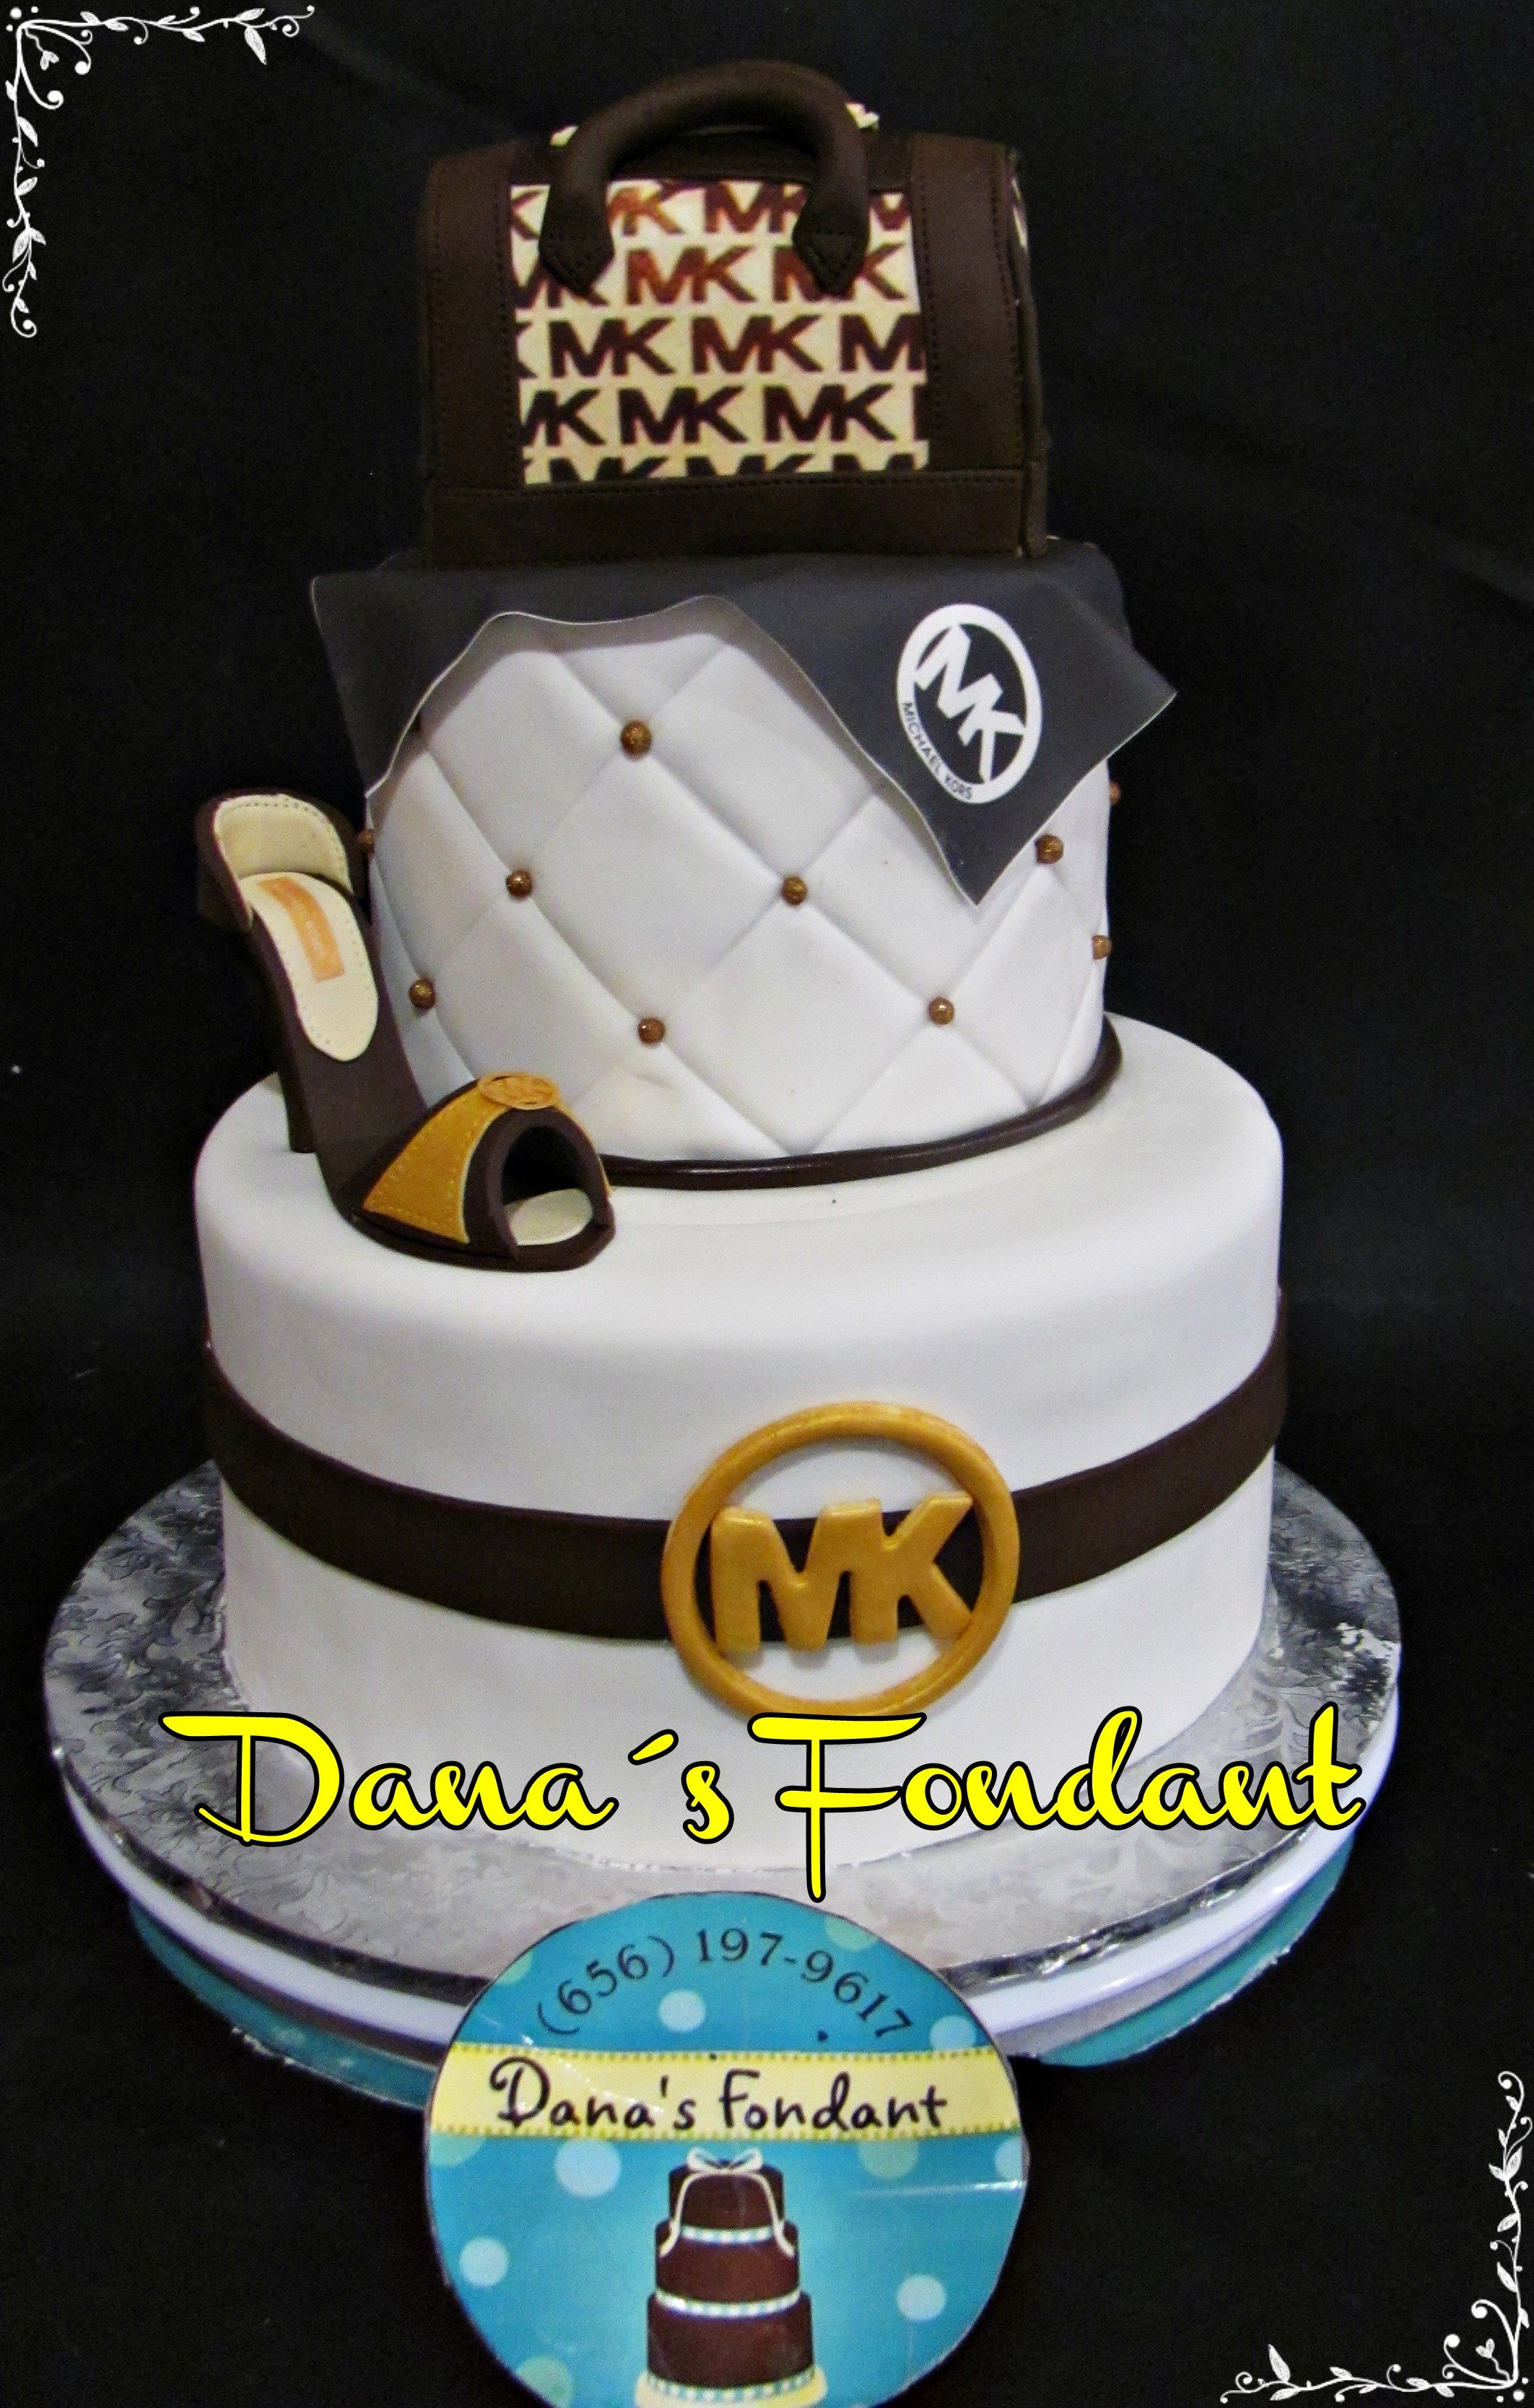 7334f6ae8 Michael Kors Cake   Michael Kors Handbag Cake.   Cake, Michael kors ...